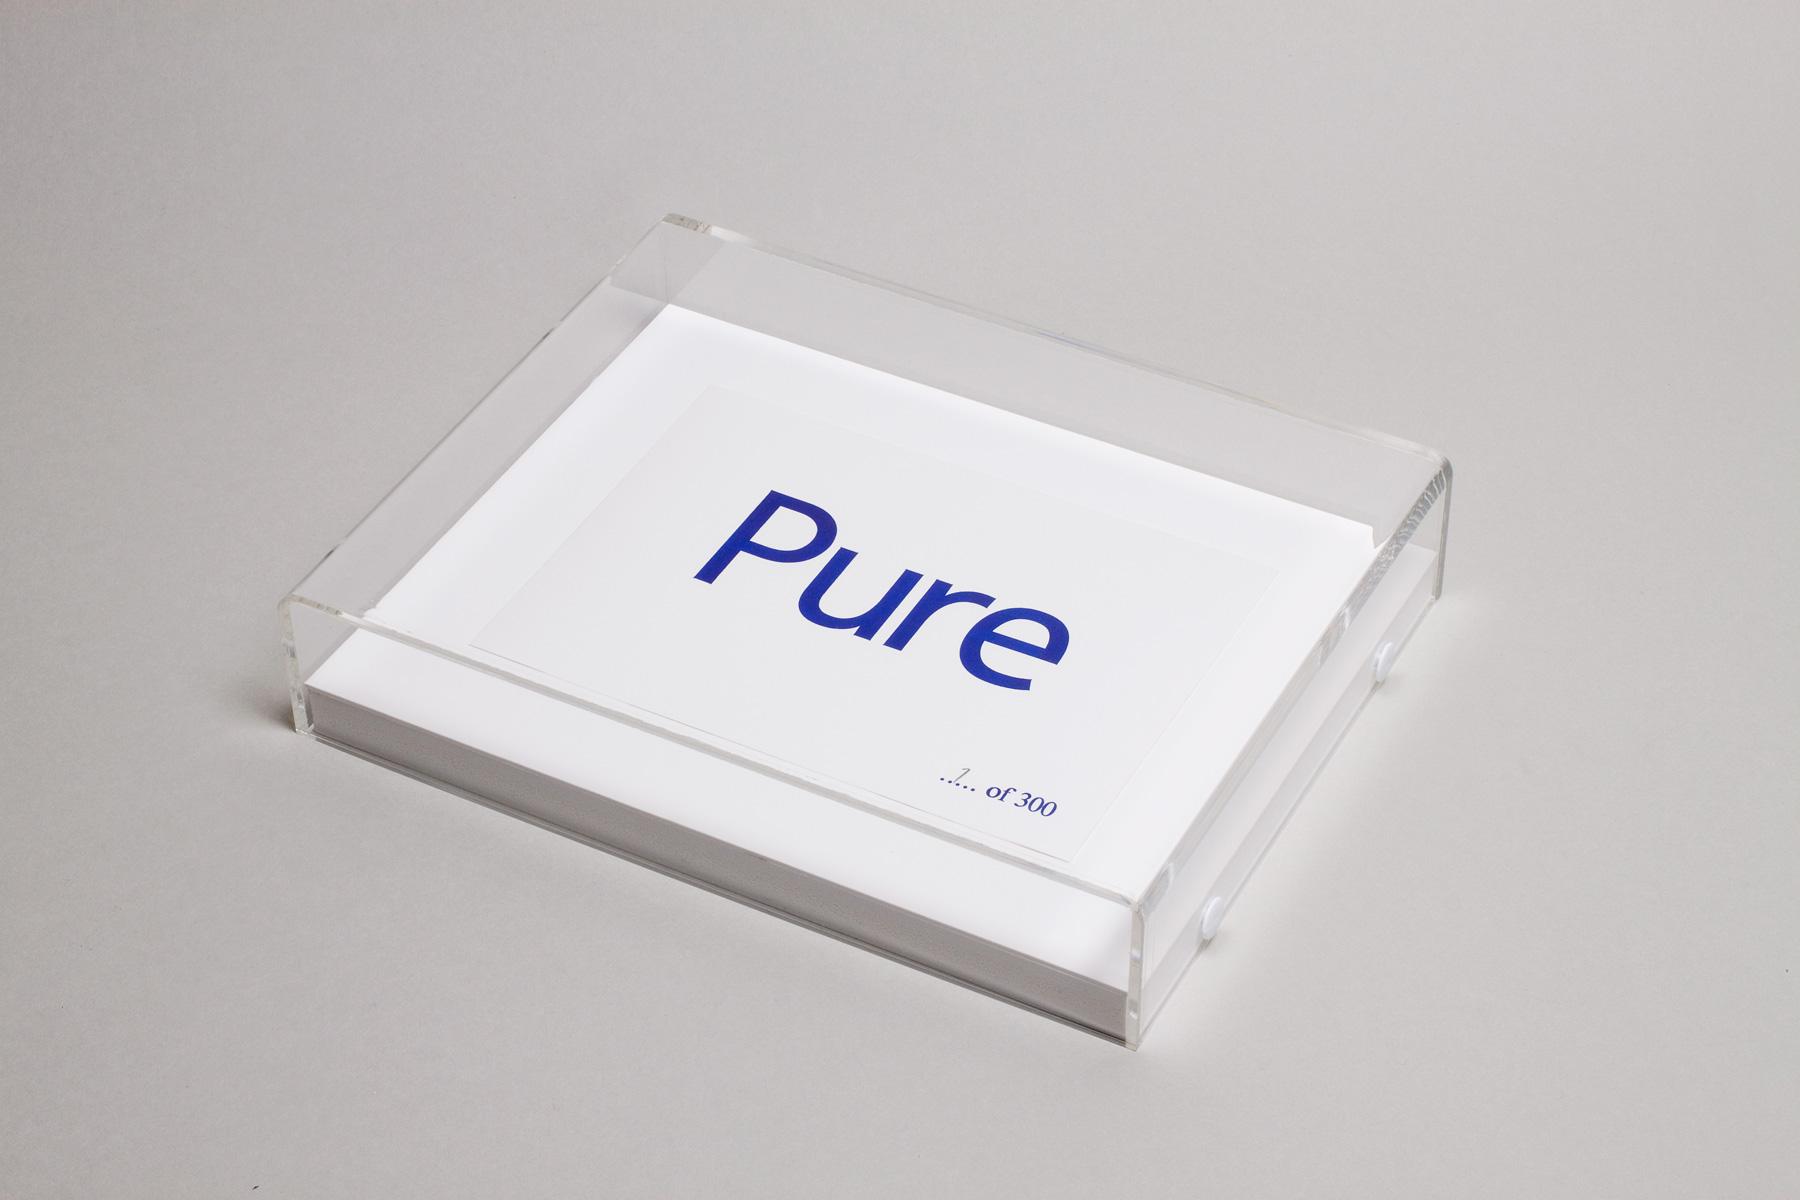 Build— +44(0)208 521 1040 / PureReversal